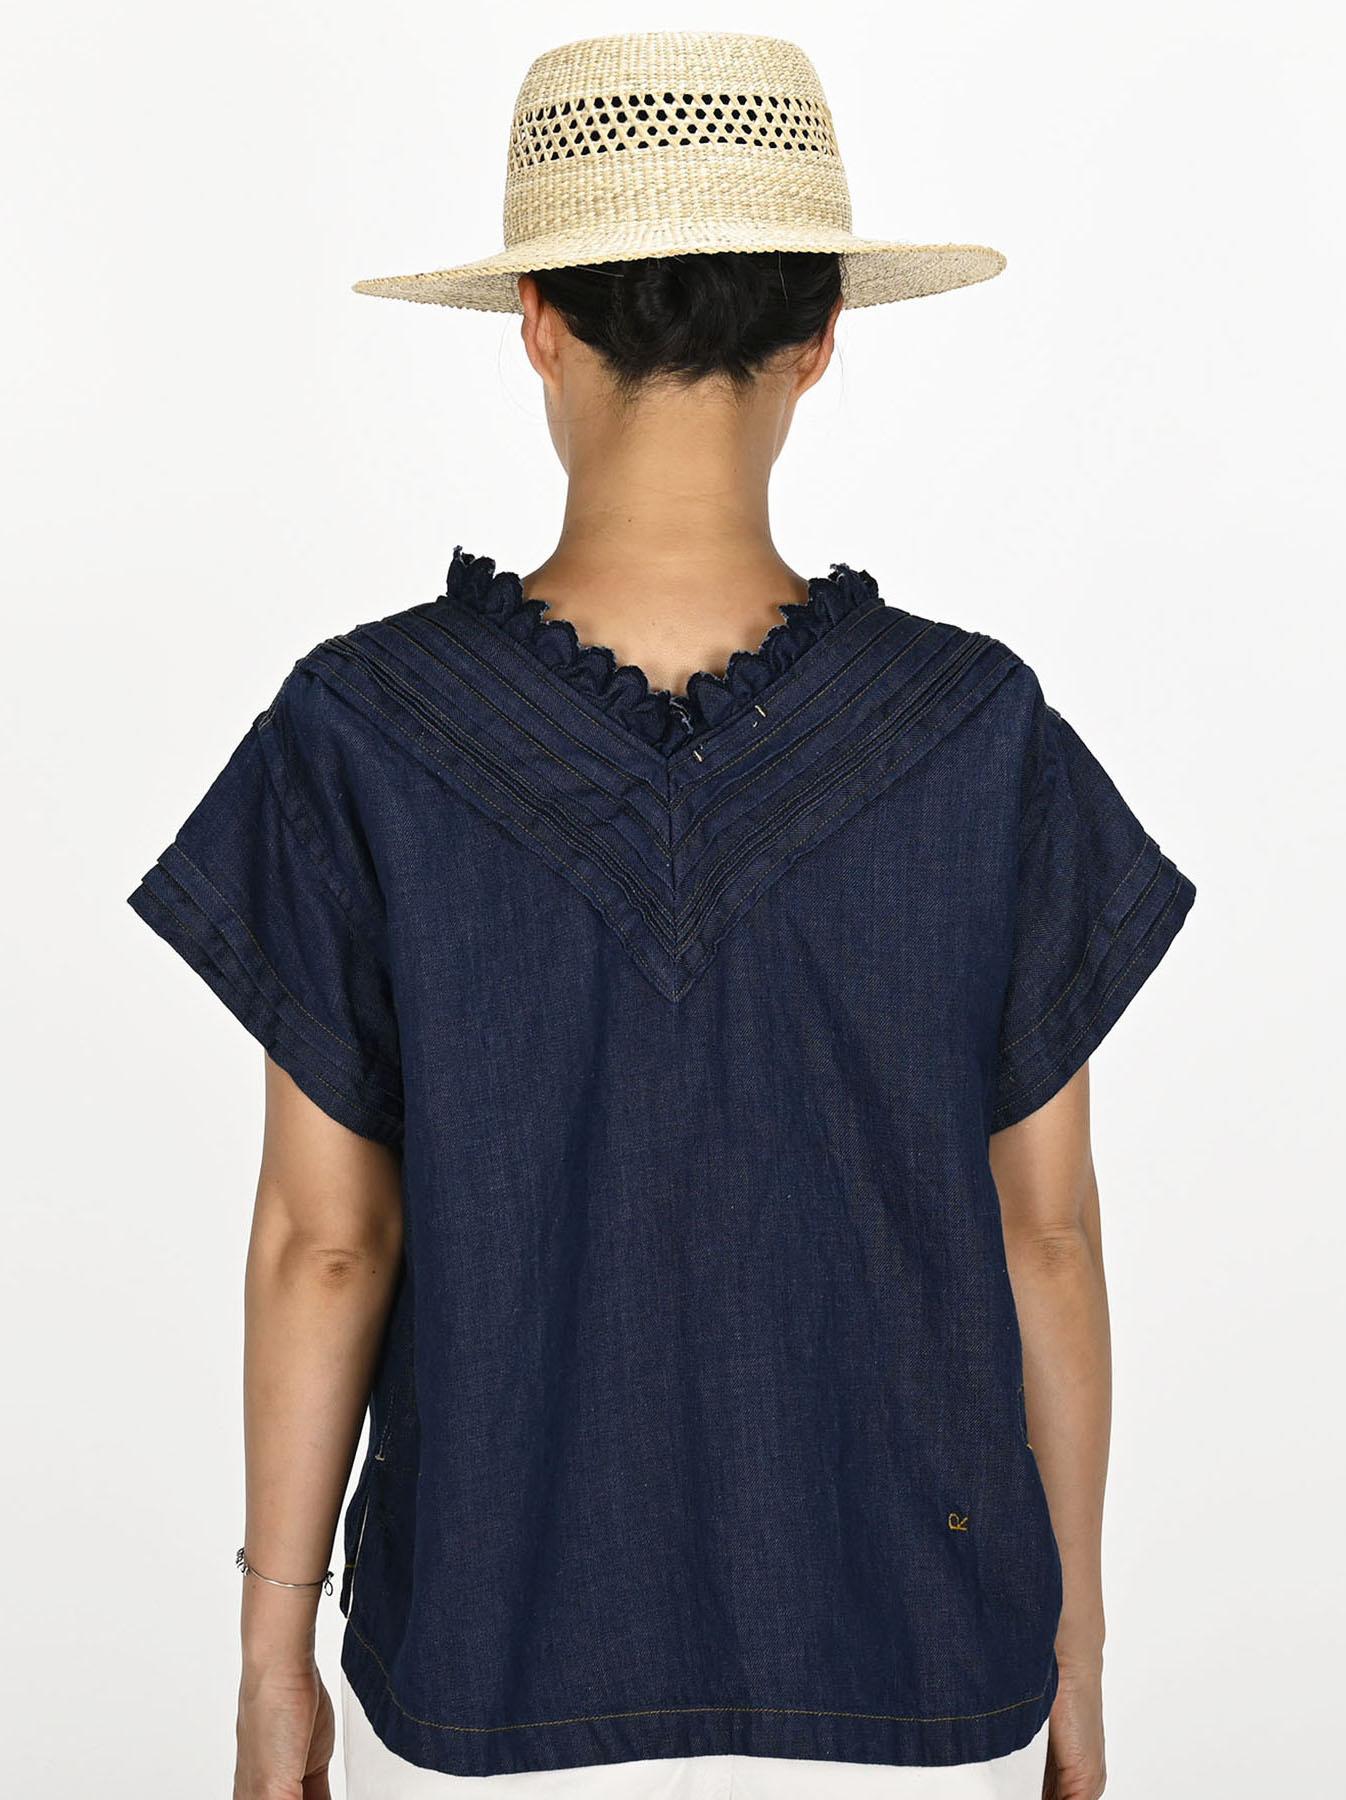 Komugi Denim Tuck Lace T-shirt-4